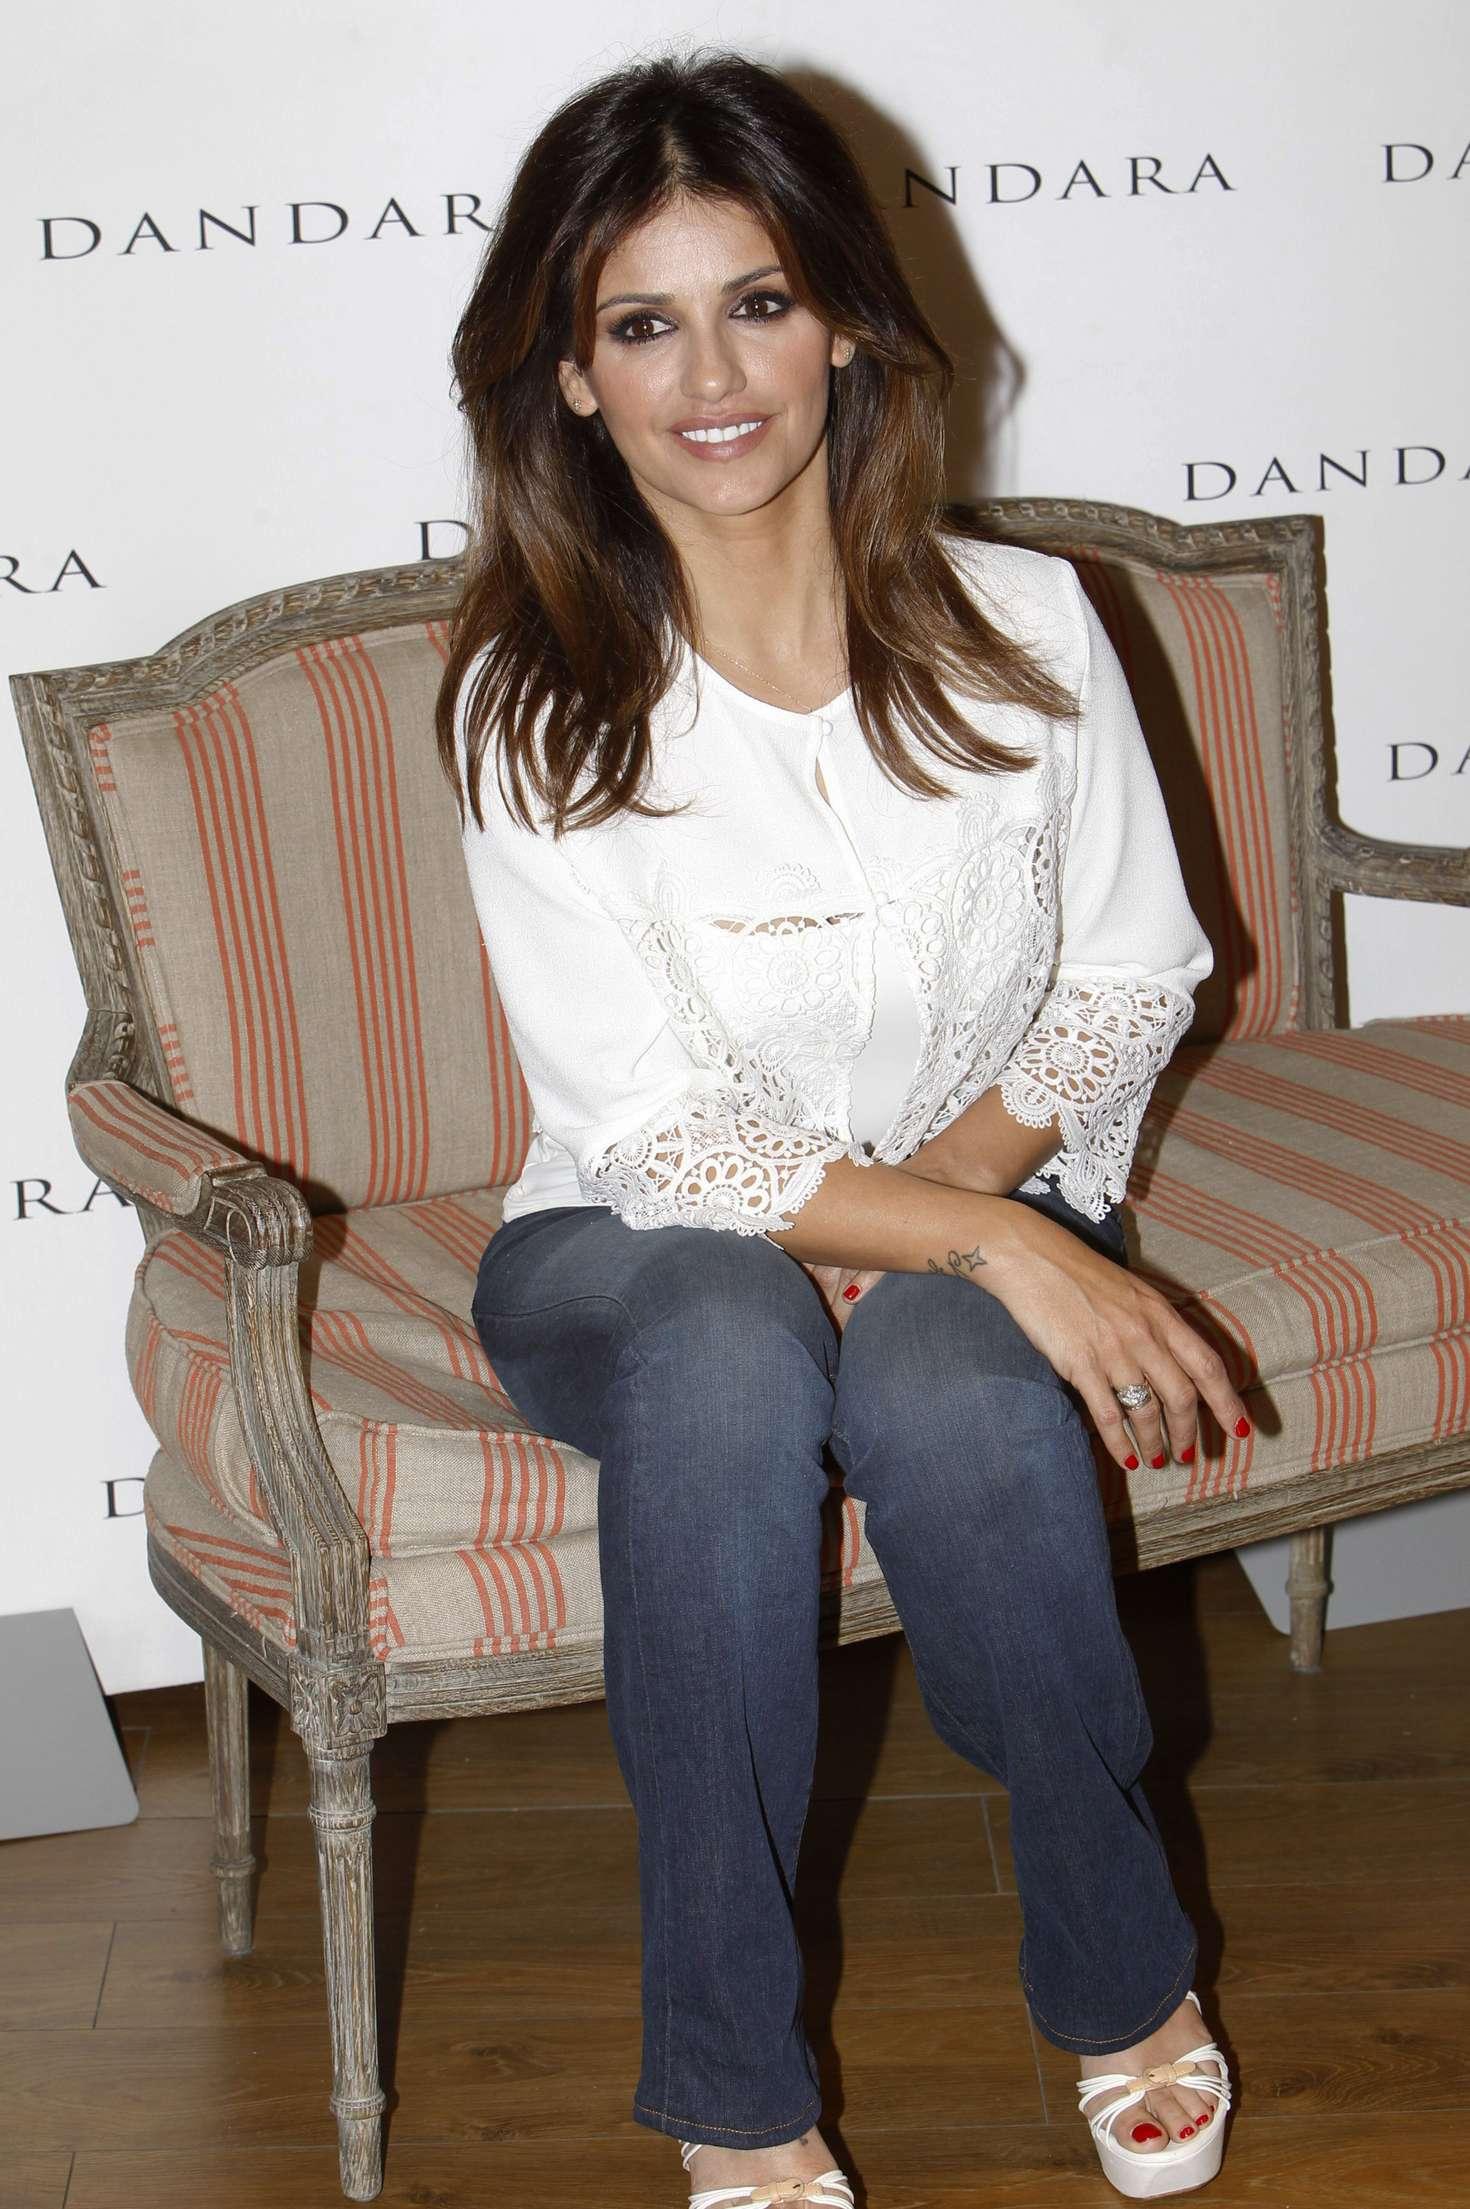 Monica Cruz Dandara Promotional Event in Madrid